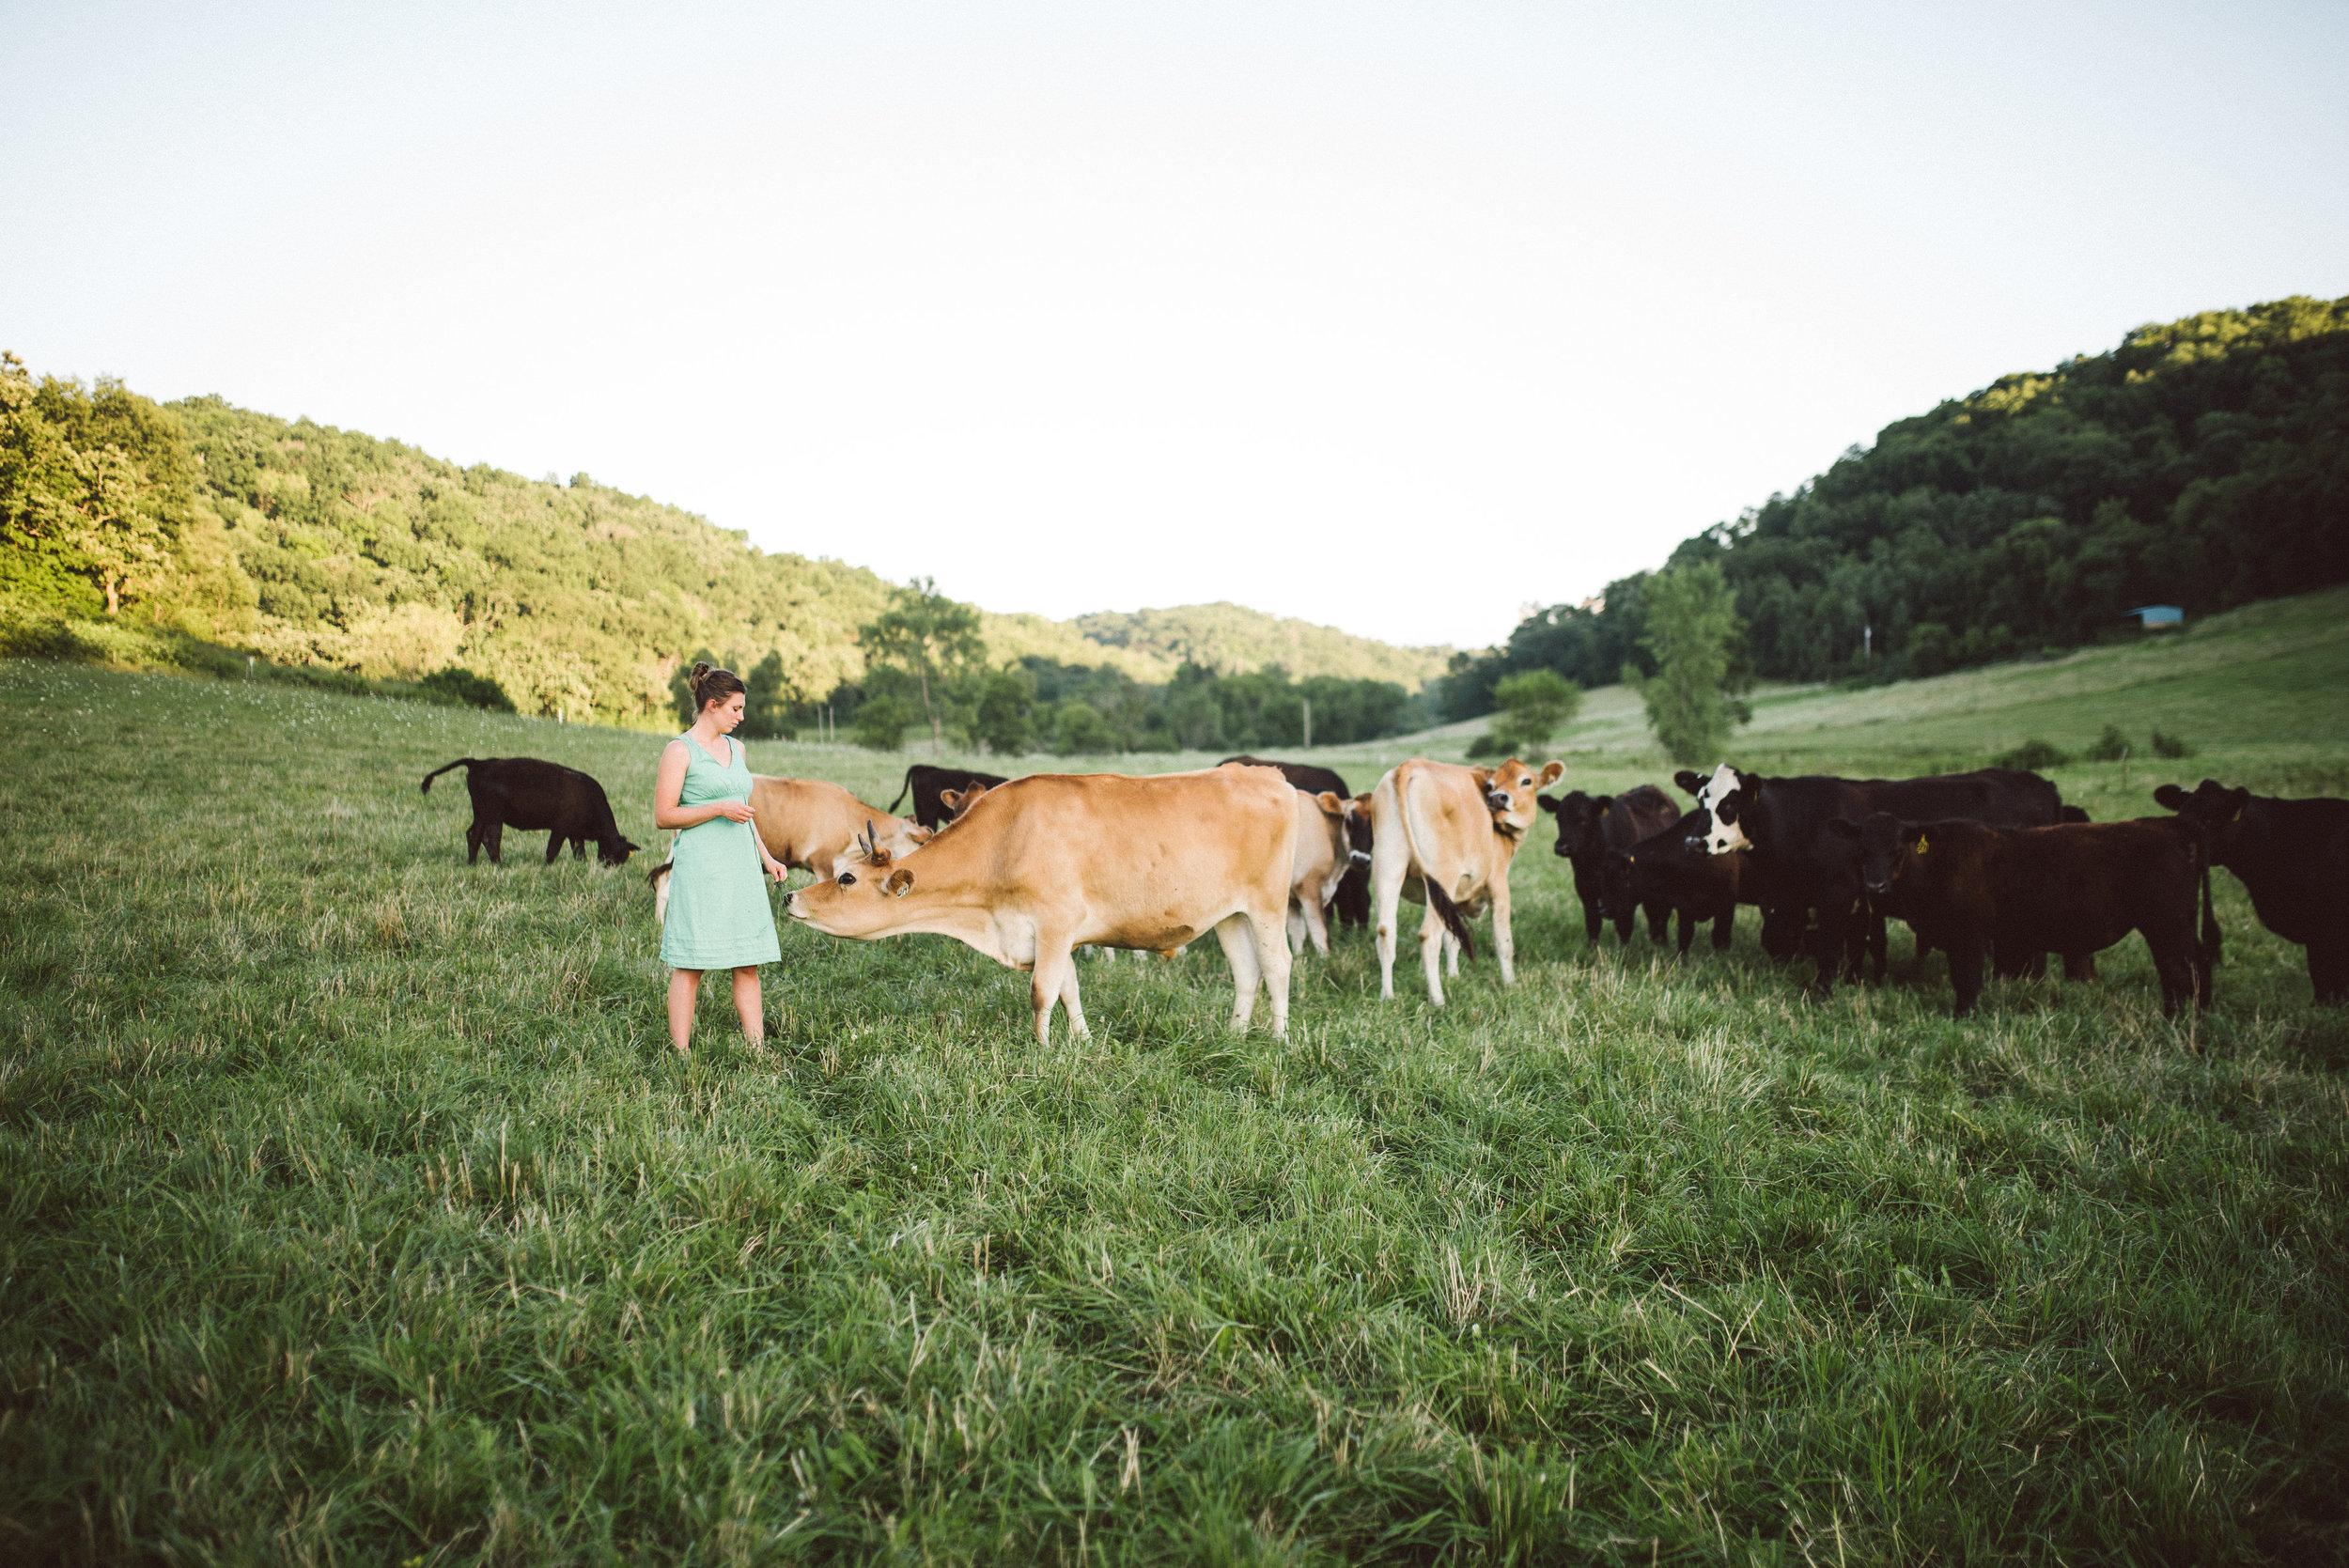 Cate_Family_Farm_Wisconsin-14.jpg